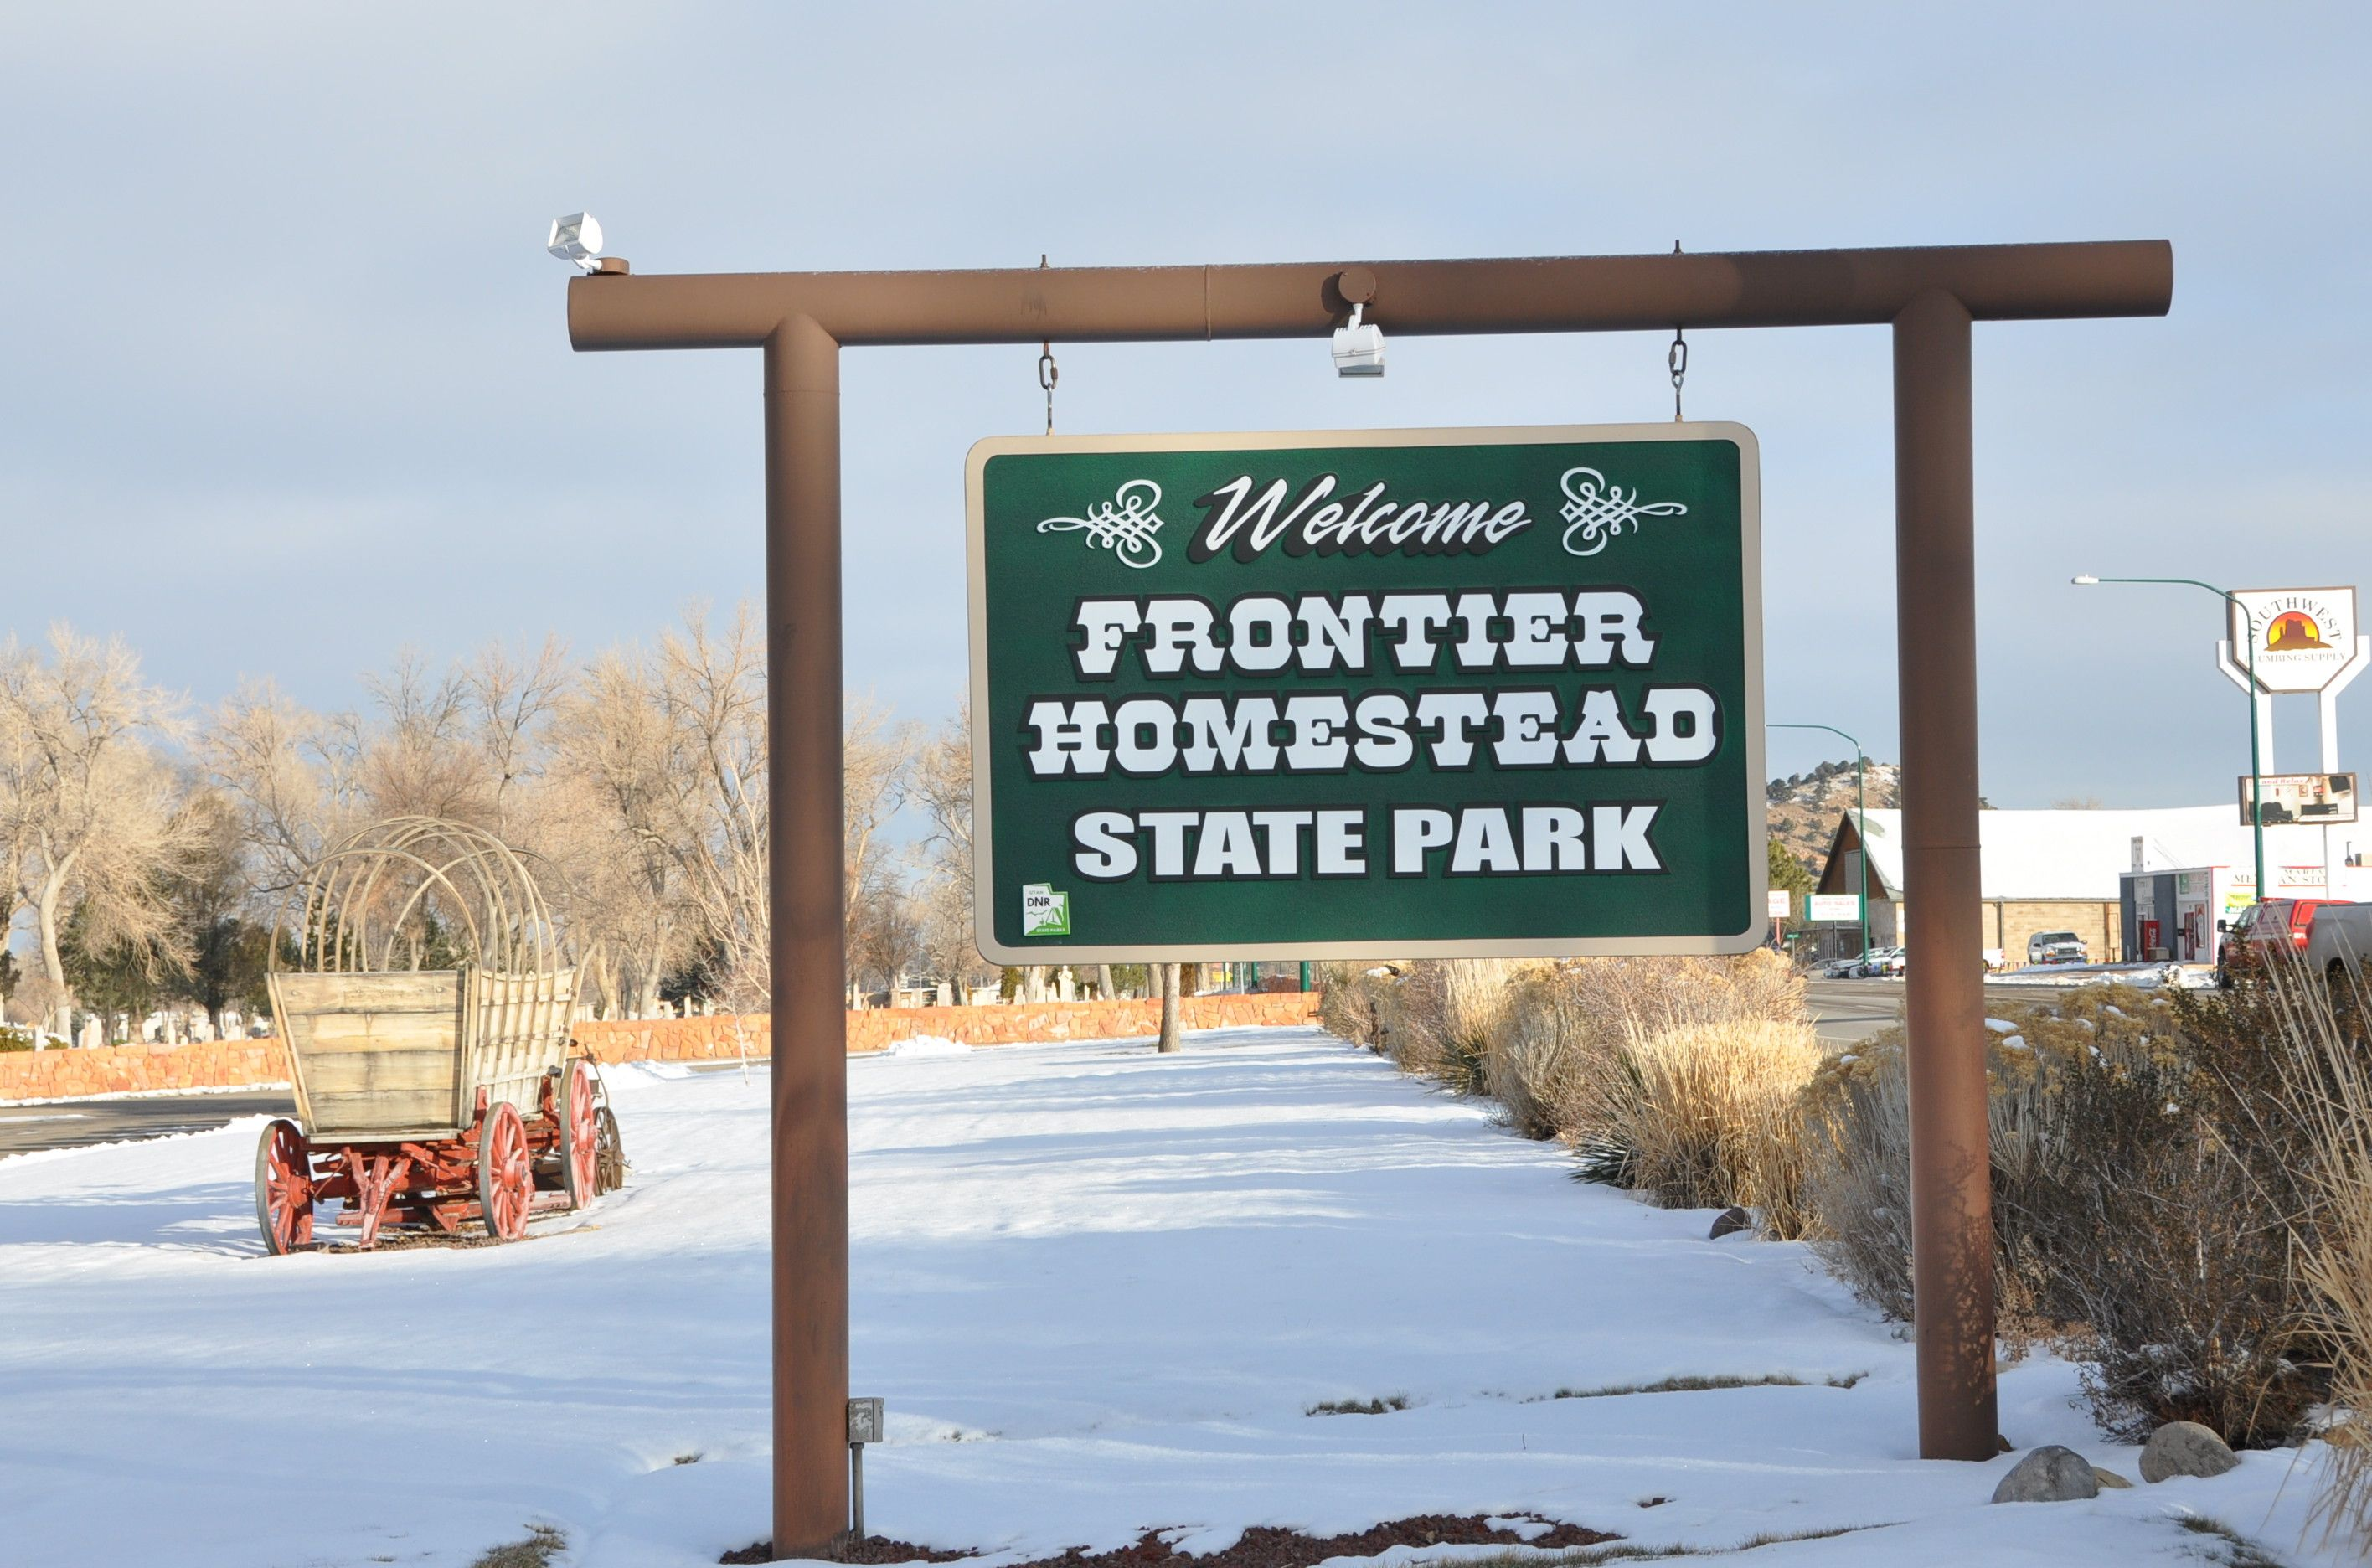 Frontier Homestead State Park, Cedar City UT